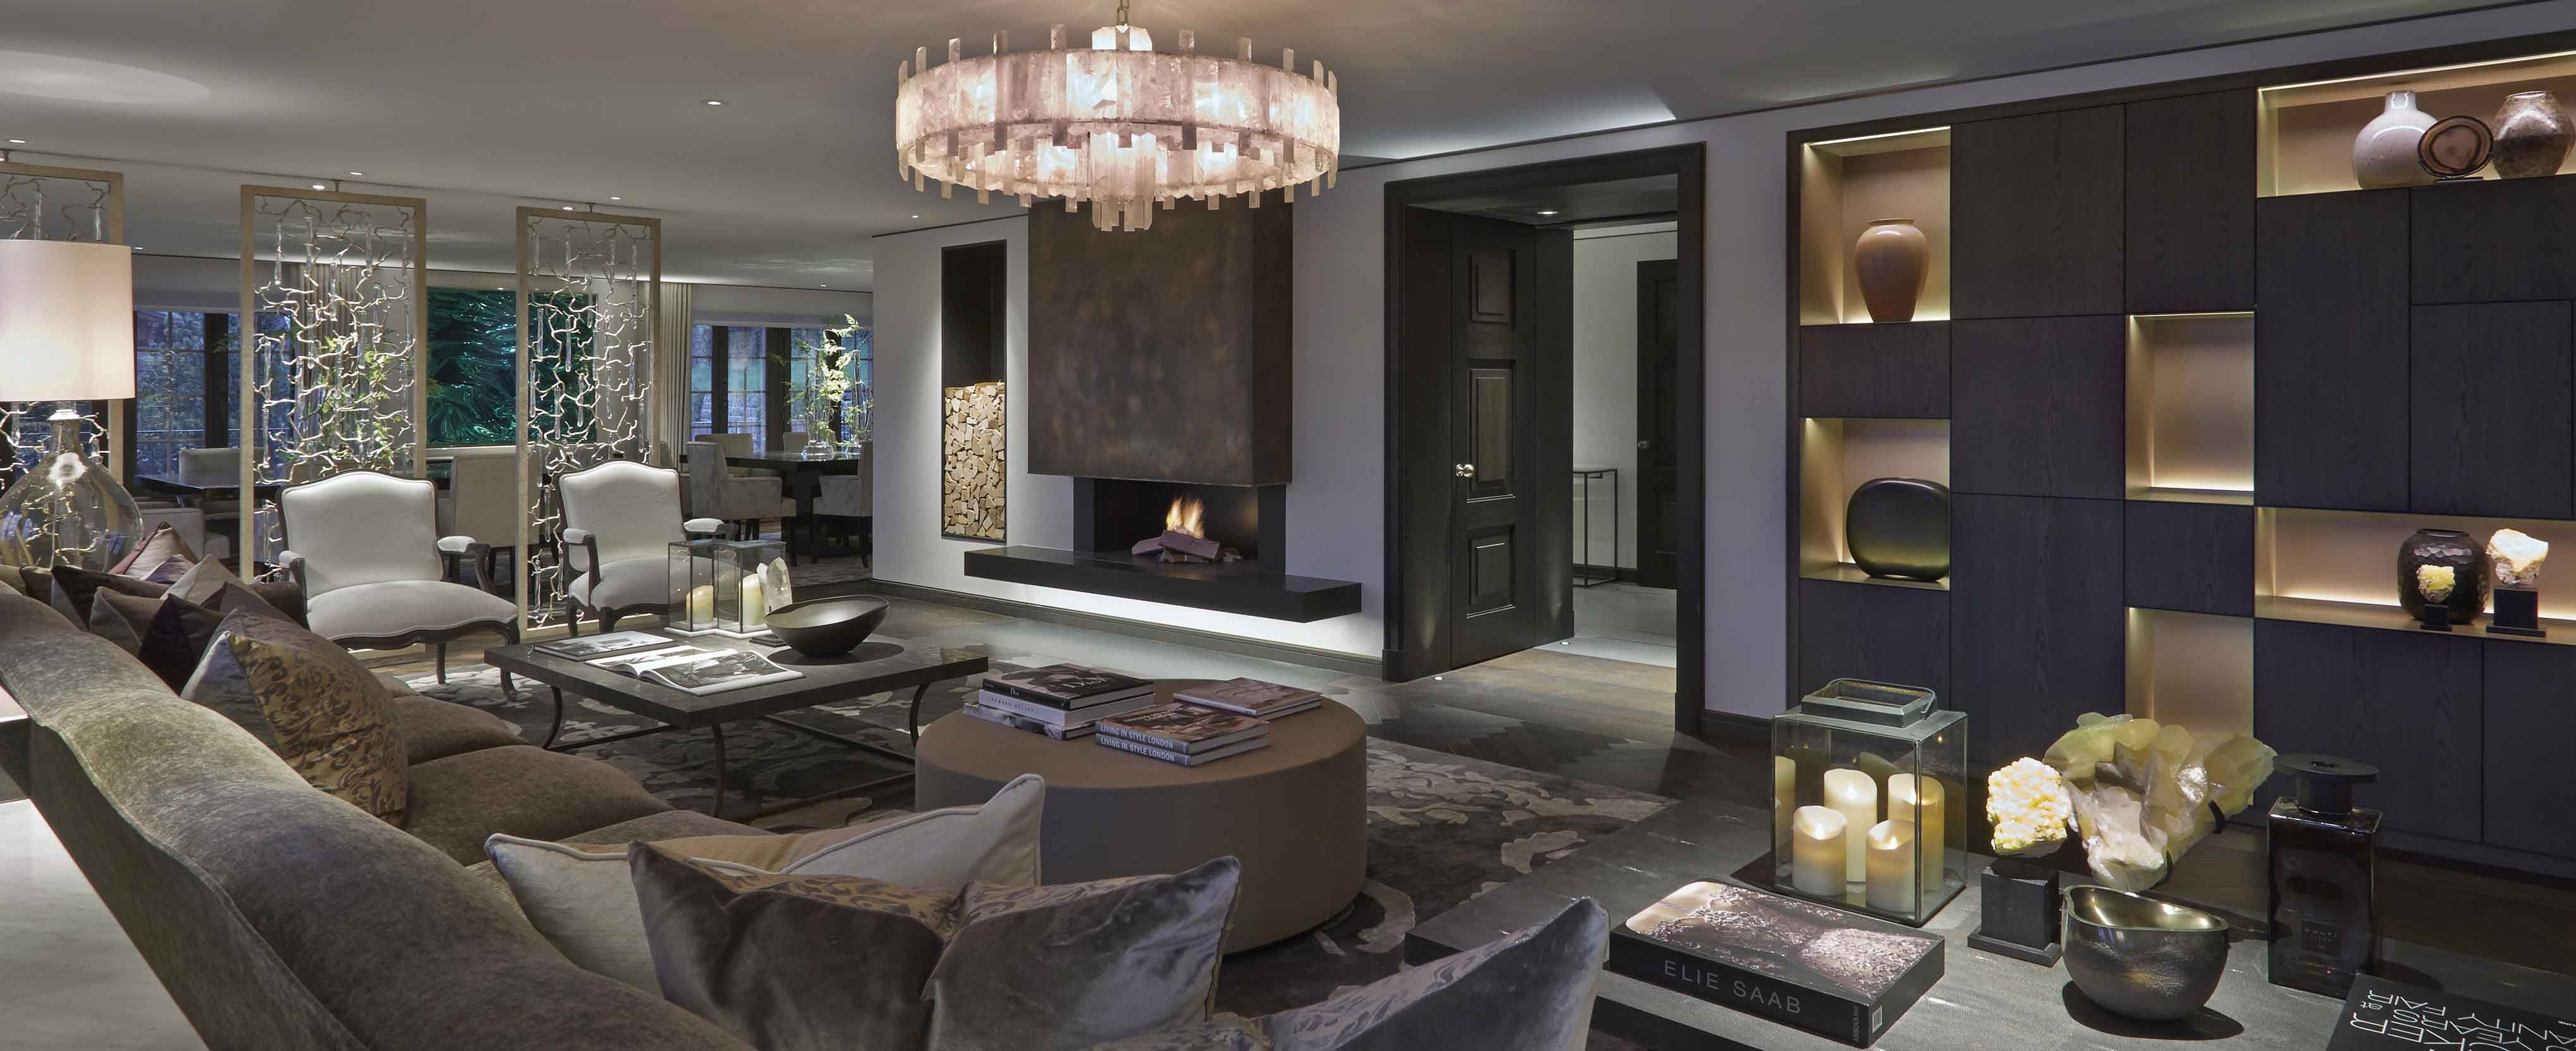 Pin By Boca Do Lobo On Living Room Design Ideas Interior